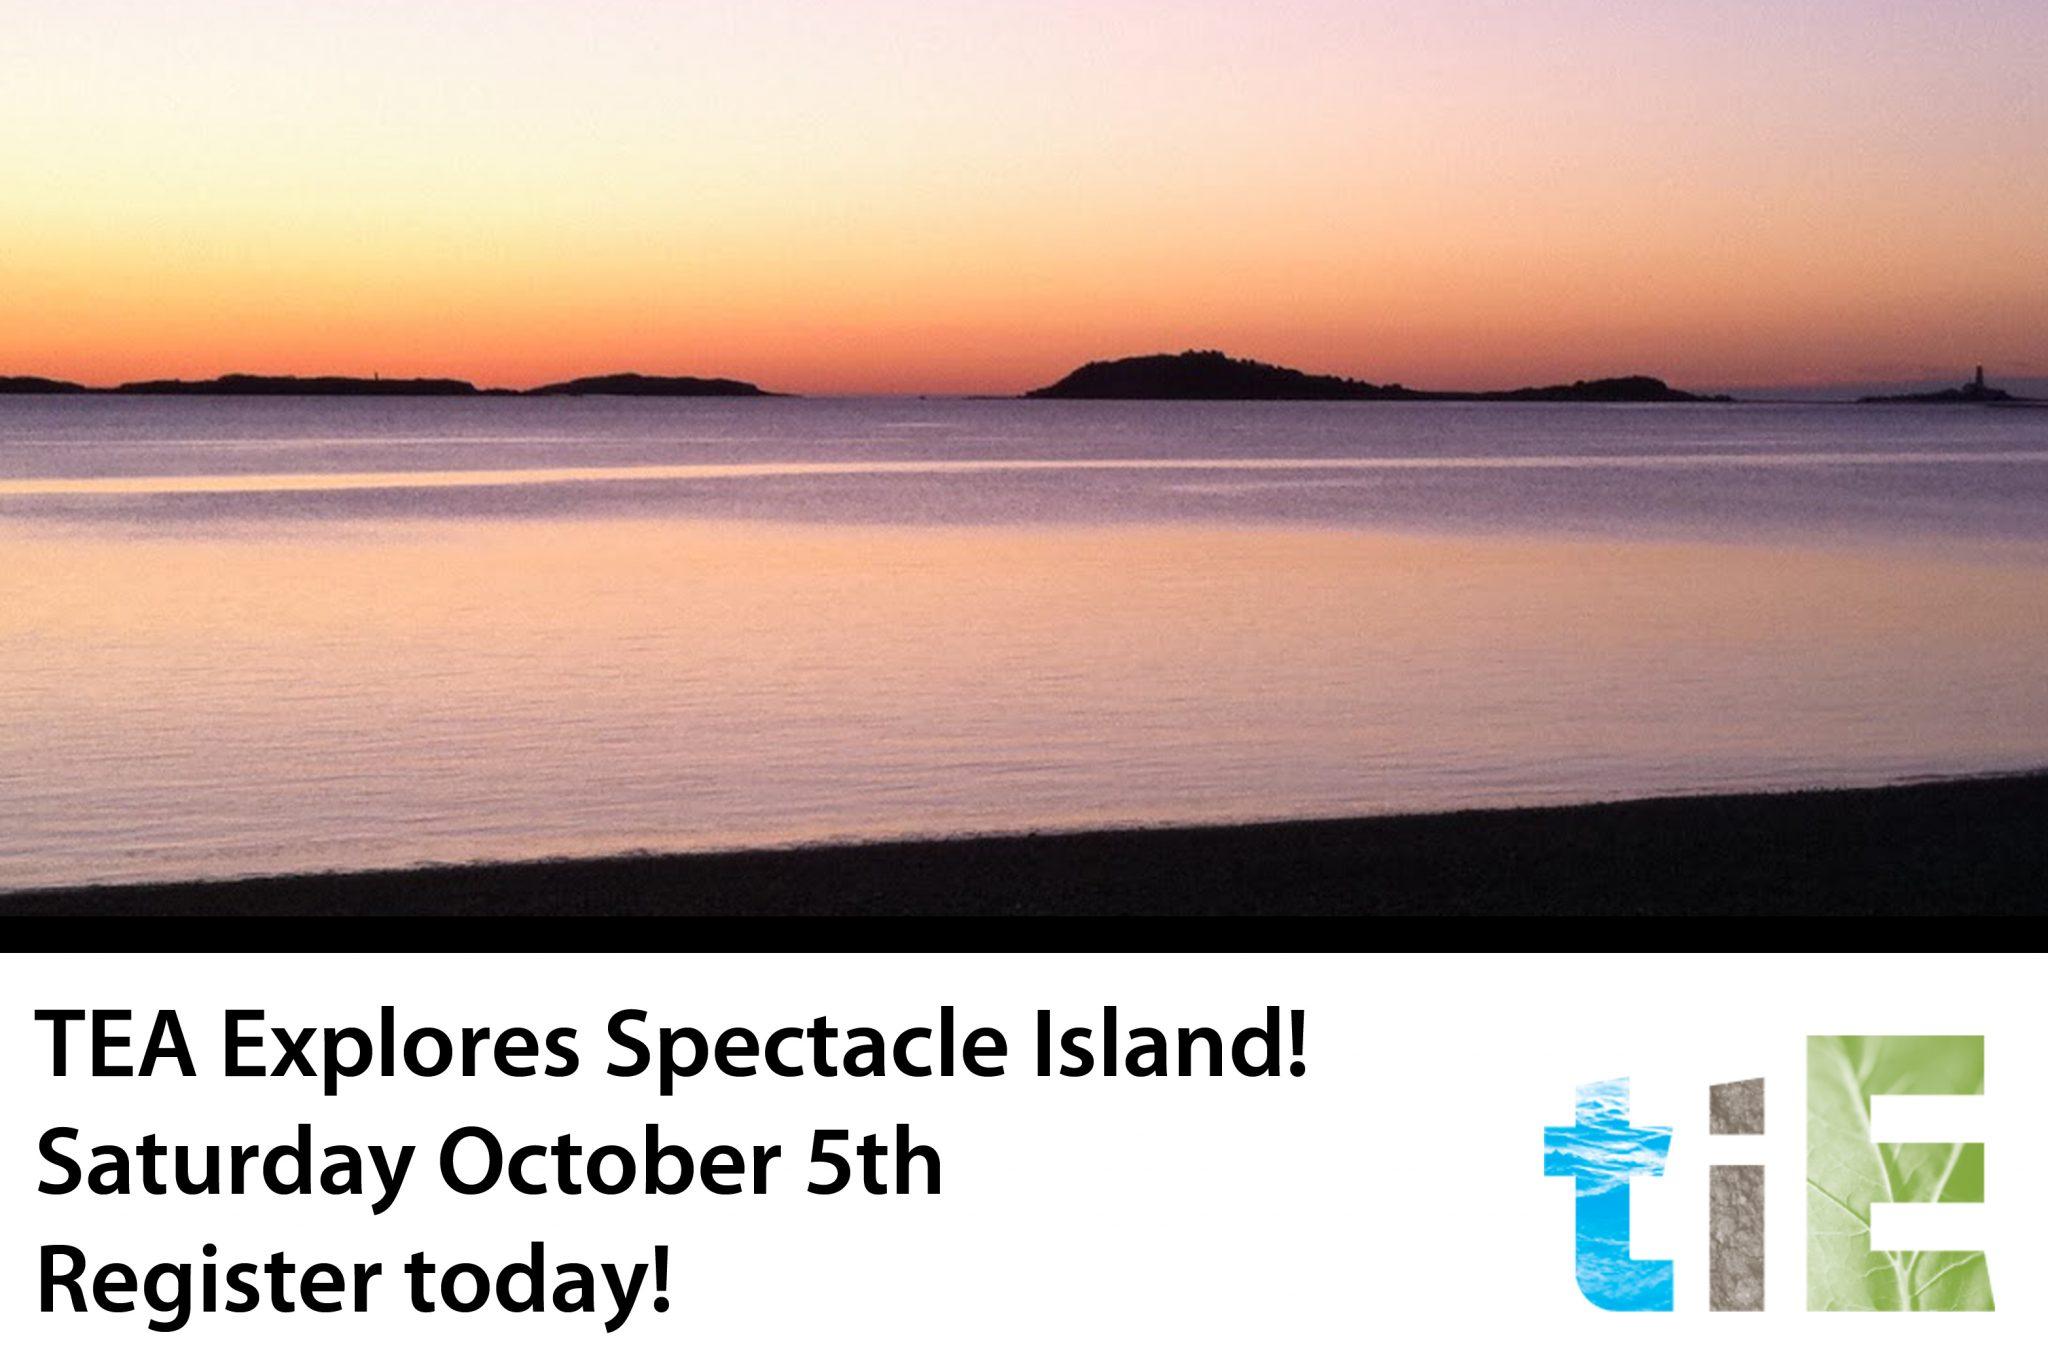 TIE_TUFTS ENVIRONMENTAL ALUMNI FALL HIKE: EXPLORING SPECTACLE ISLAND